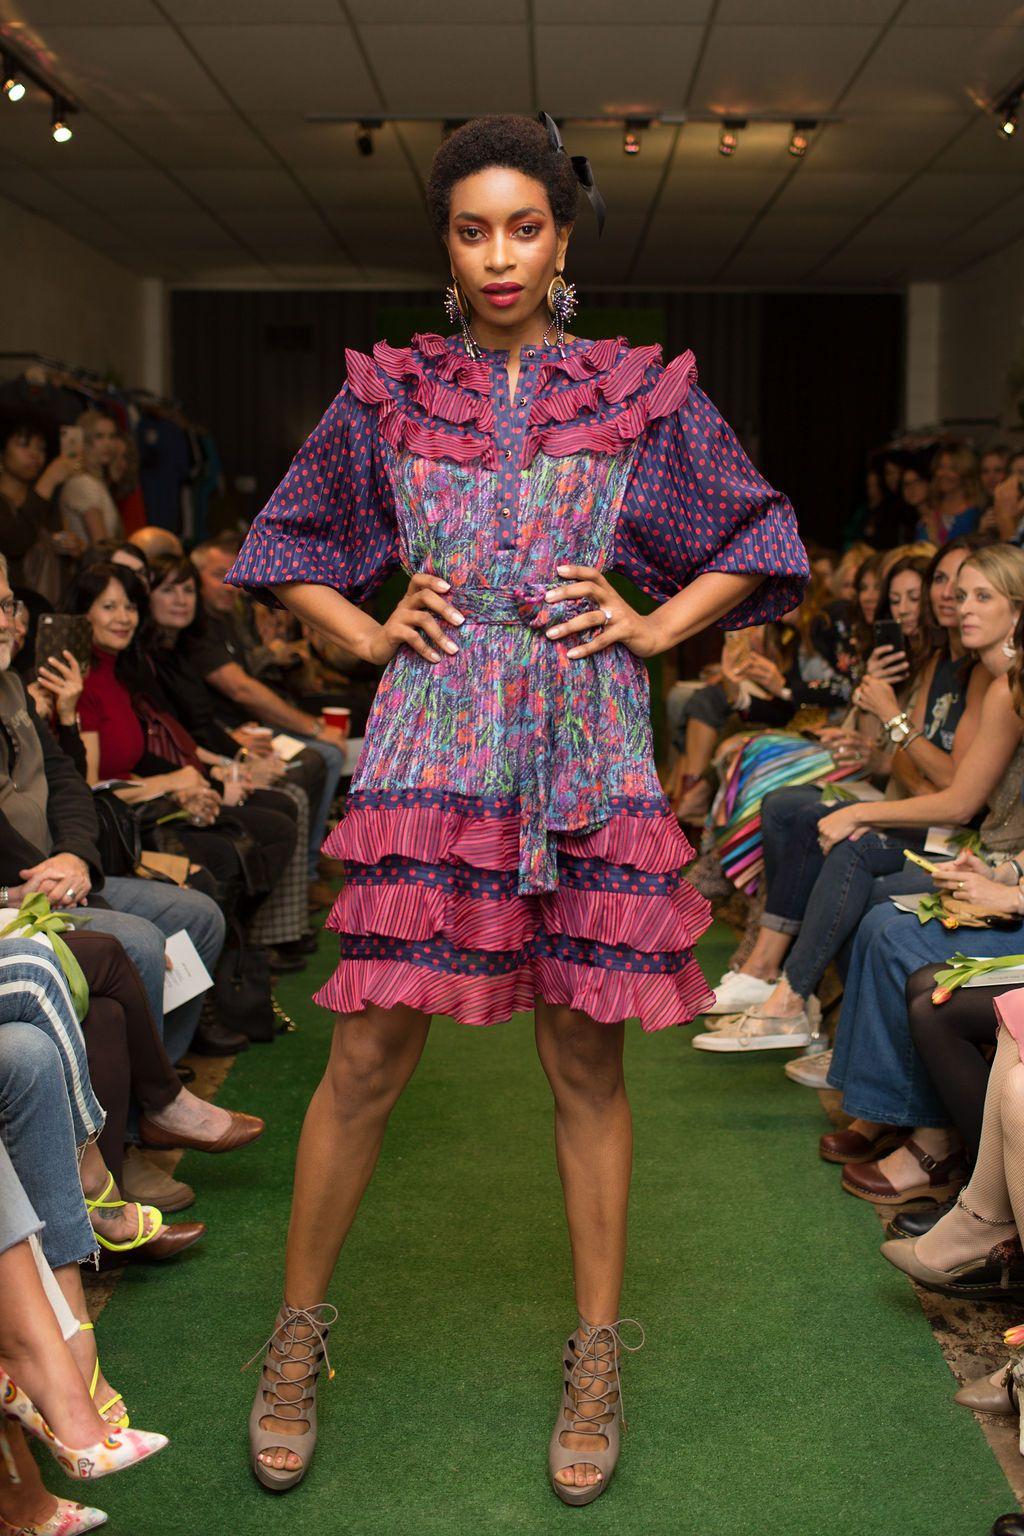 Spring 2019 Fashion Show At Retromended Vintage In Orlando Fl Fashion